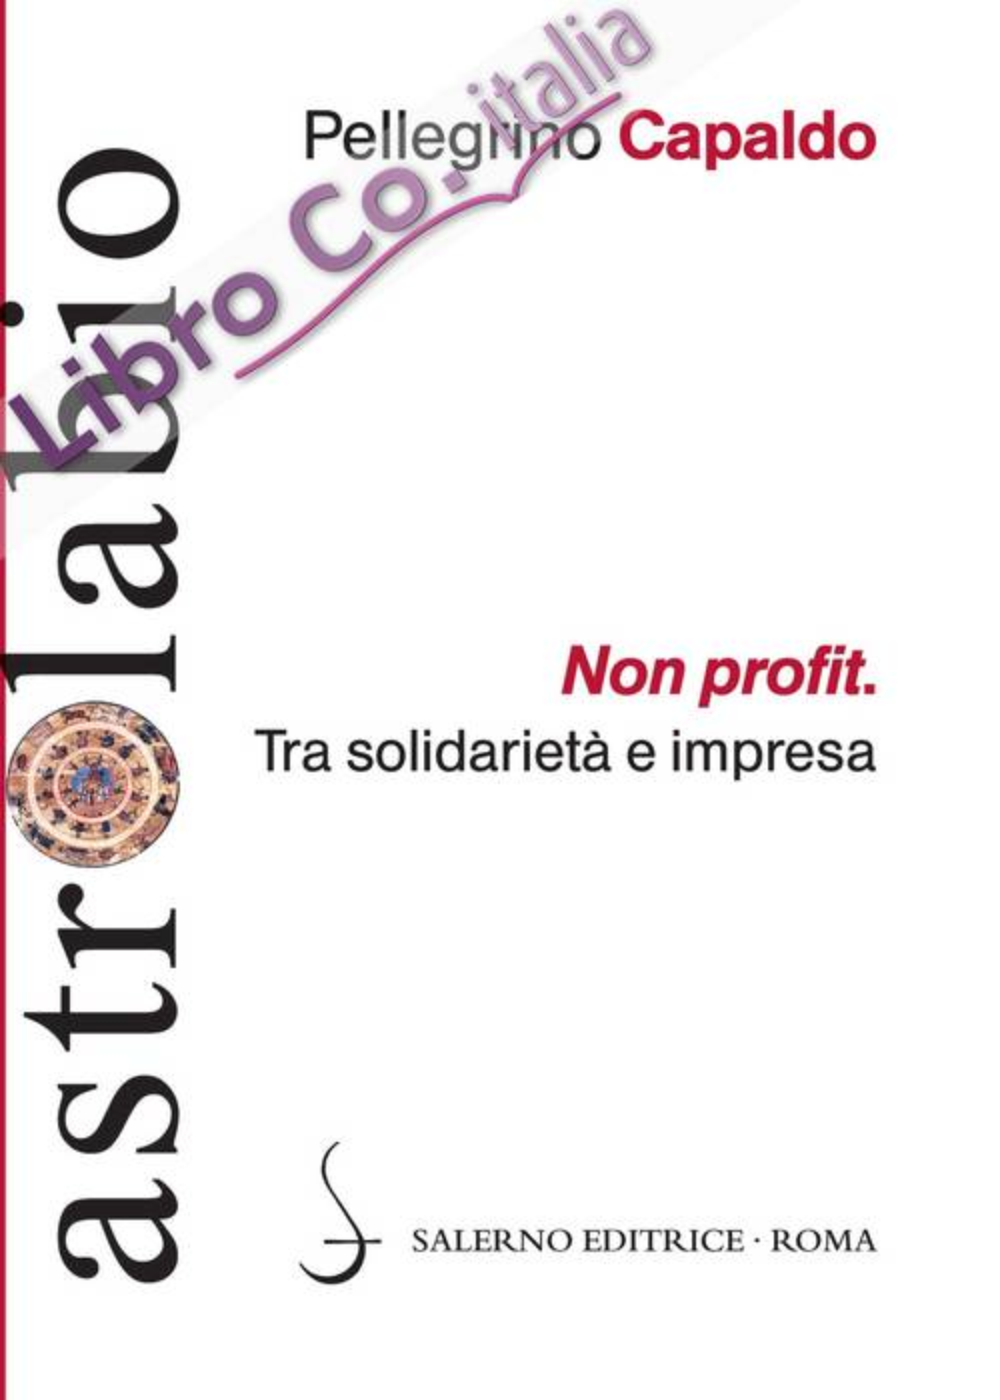 Non profit. Tra solidarietà e impresa.